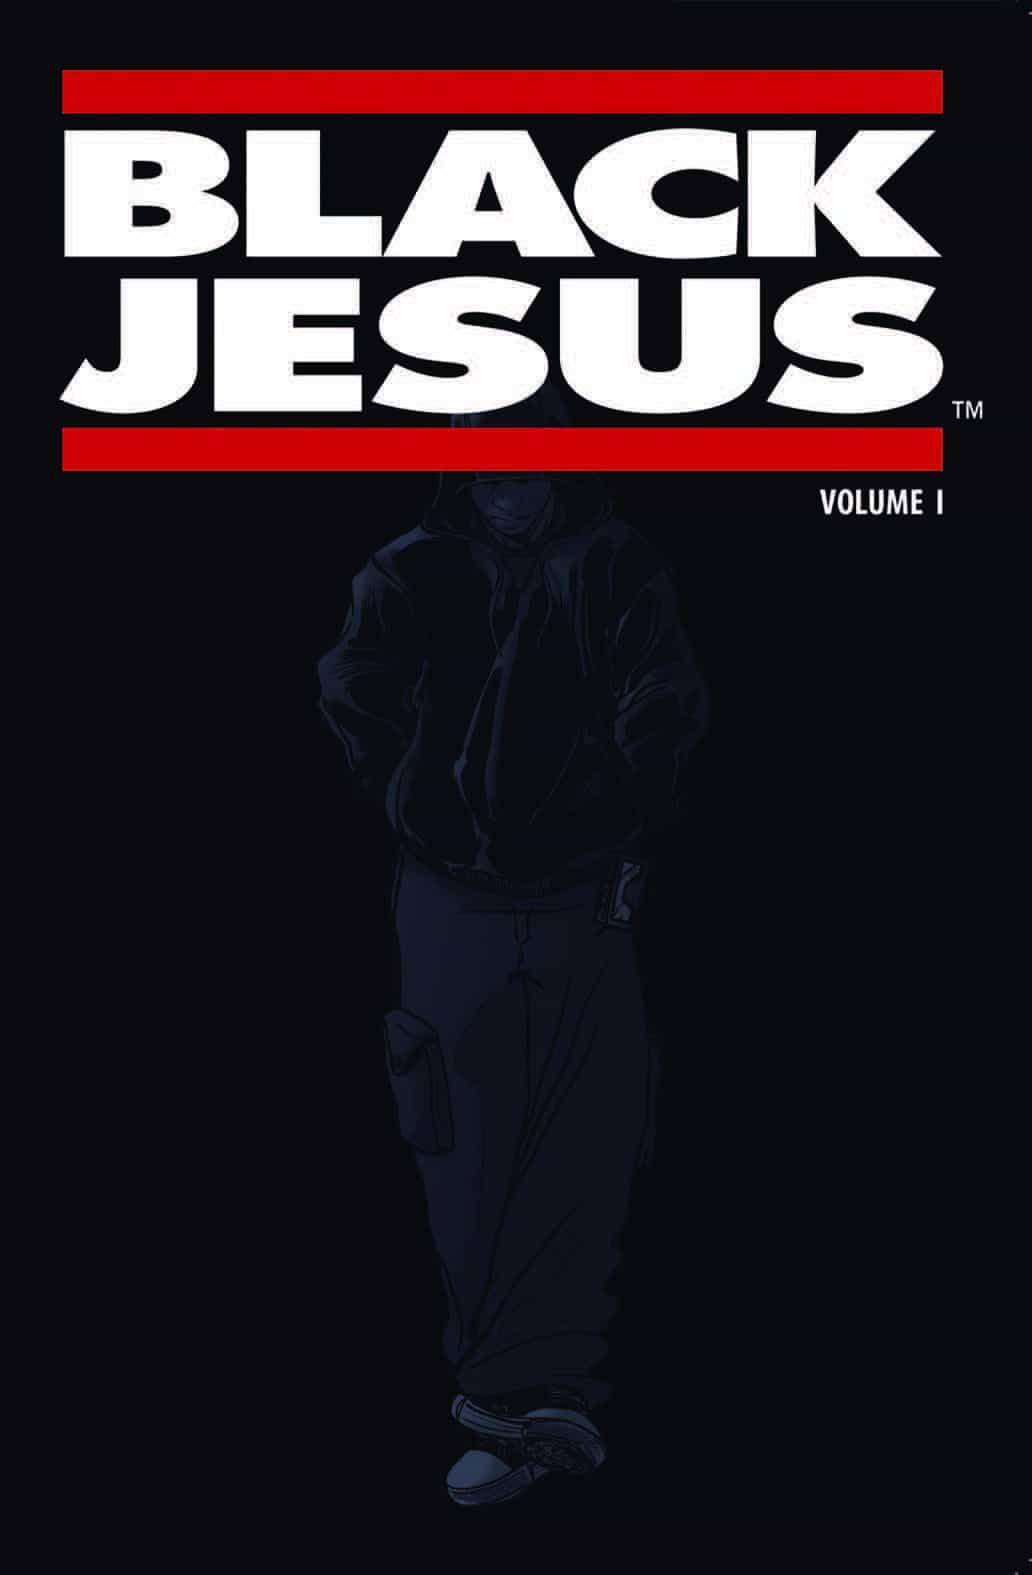 Black Jesus 2